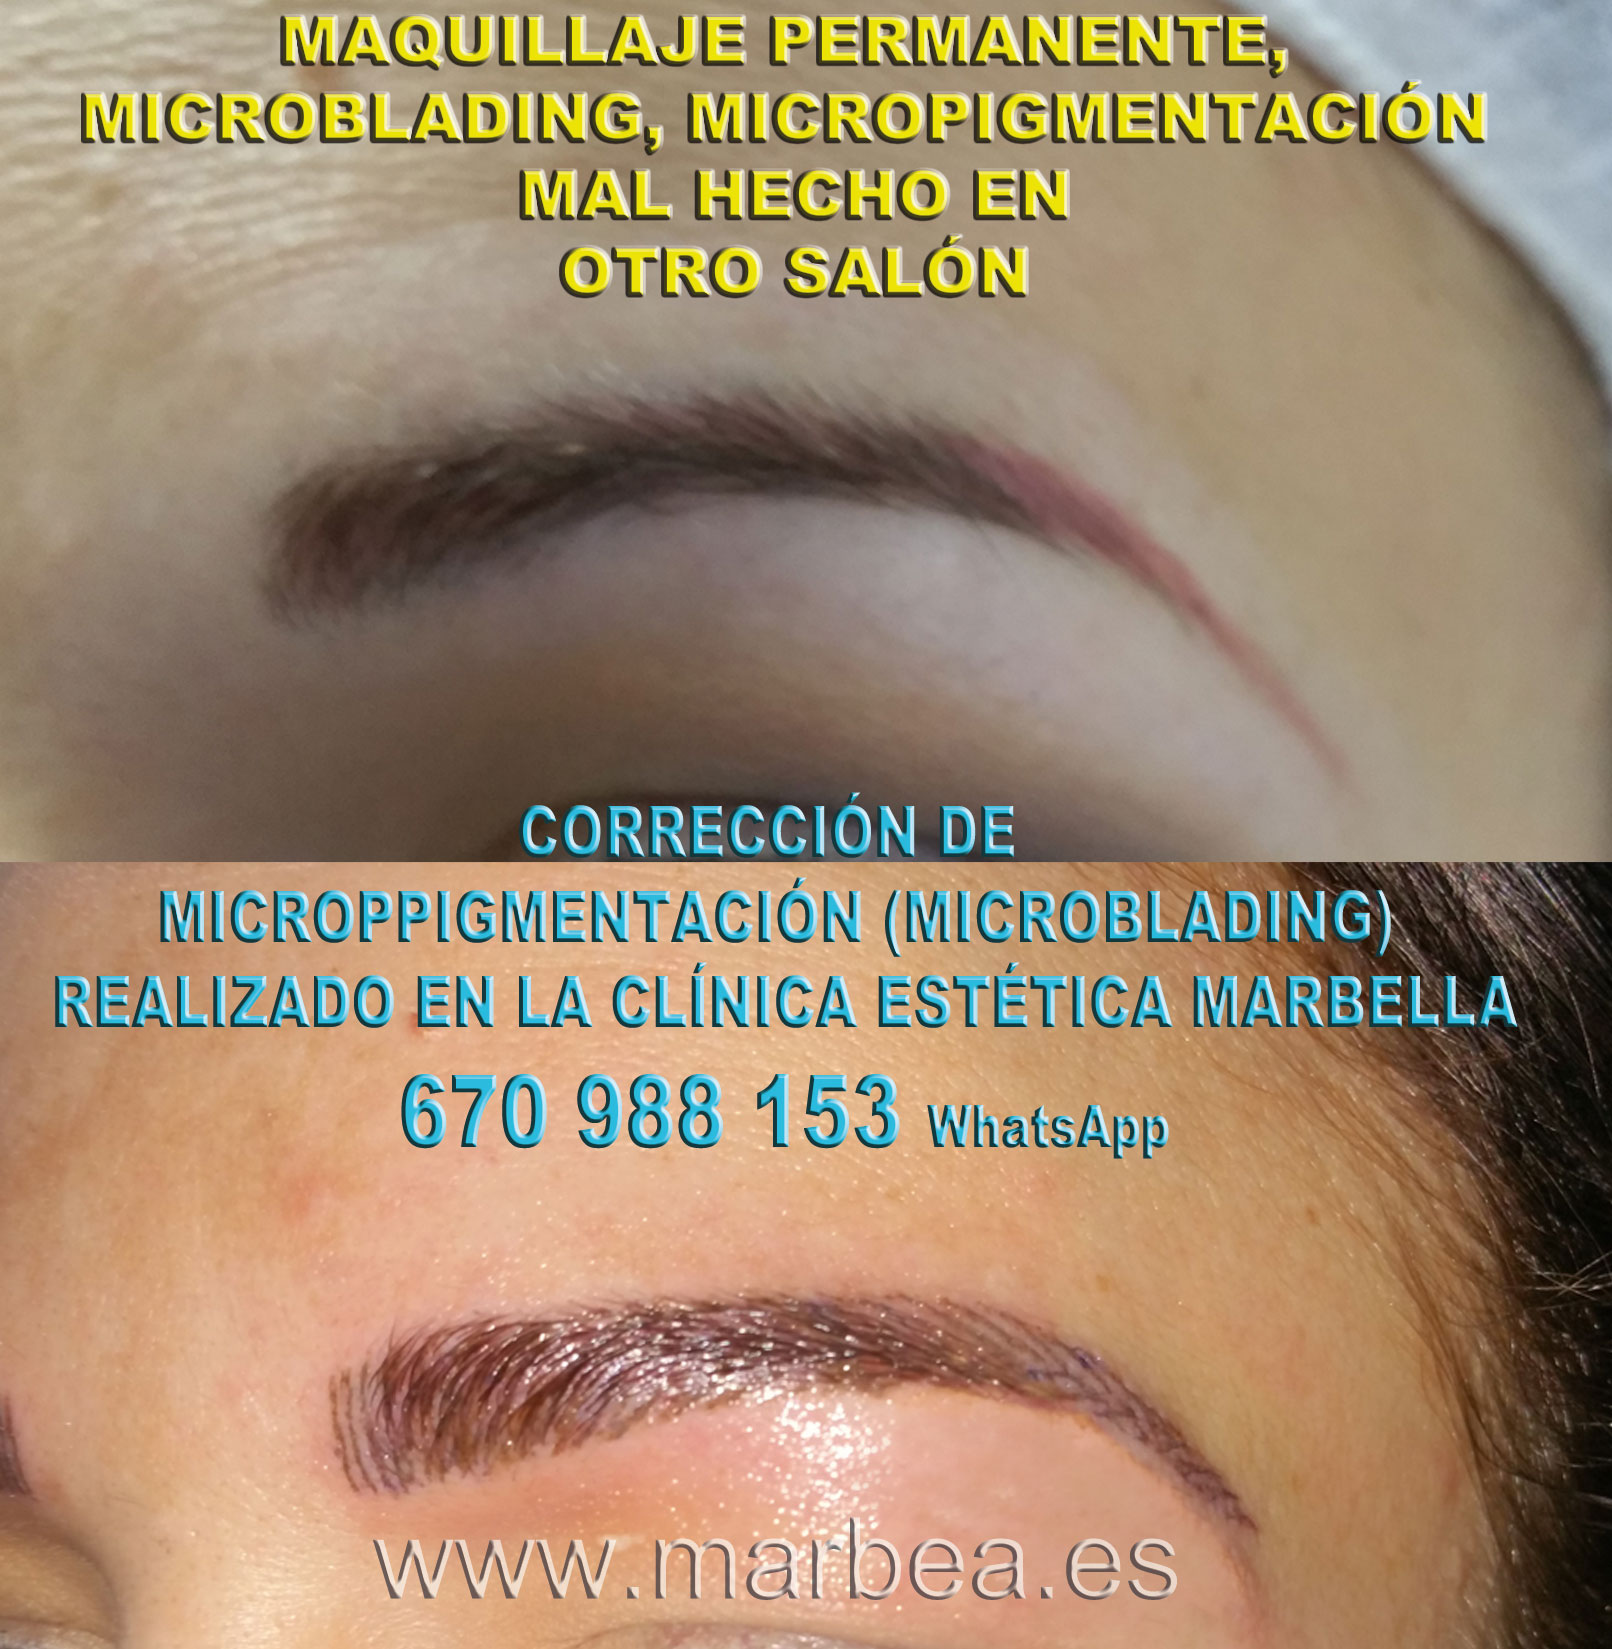 ELIMINAR TATUAJE CEJAS clínica estética microblading ofrece como aclarar la micropigmentación cejas,corregir micropigmentación mal hecha